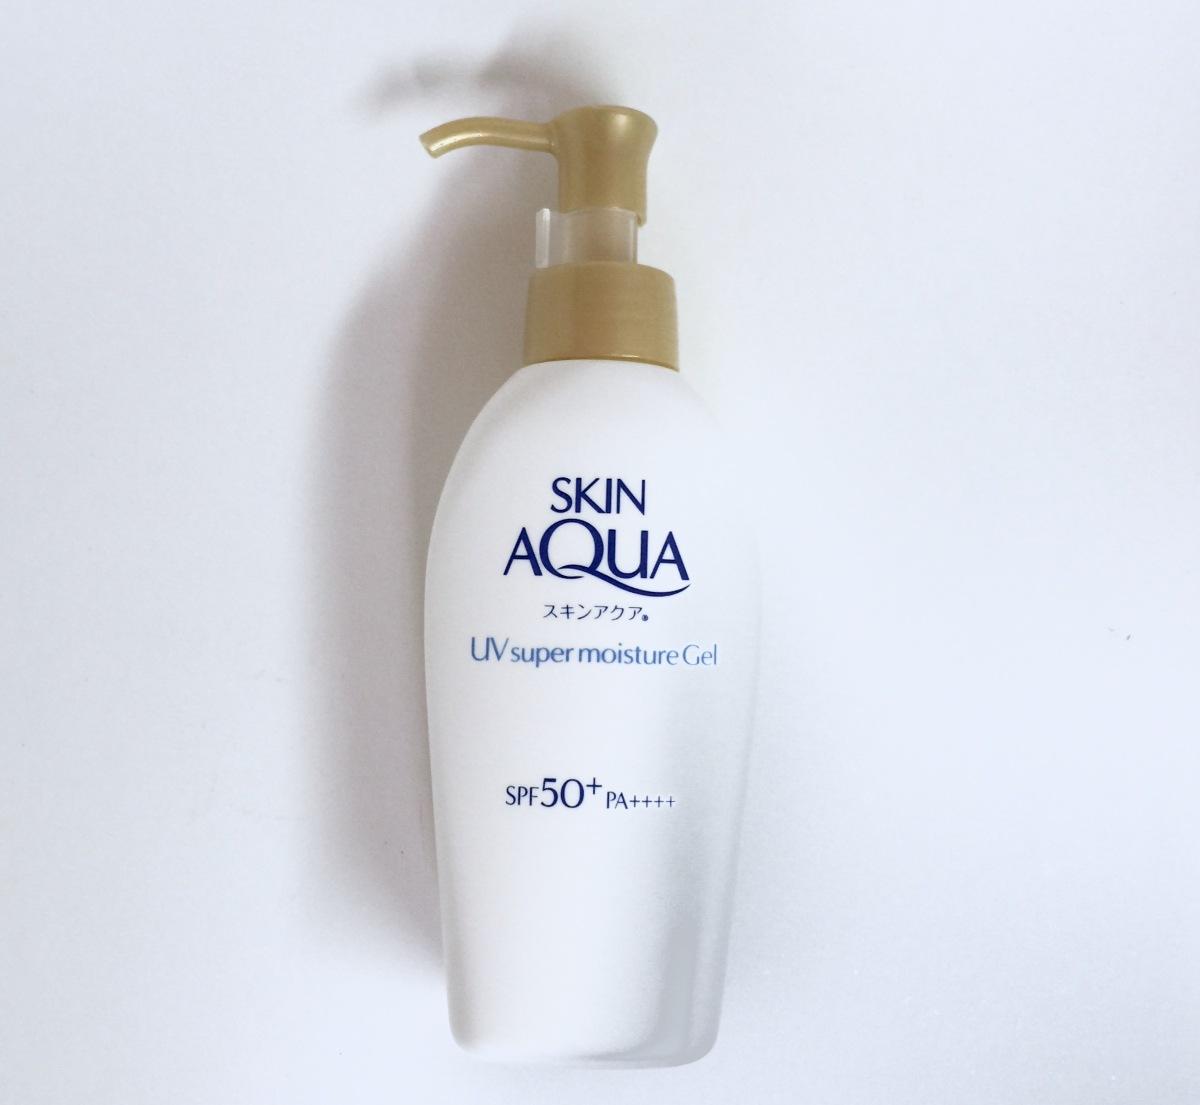 Skin Aqua Super Moisture Gel Spf50 Pa Vanity Rex Nivea Sun Lotion Spf 50 100 M